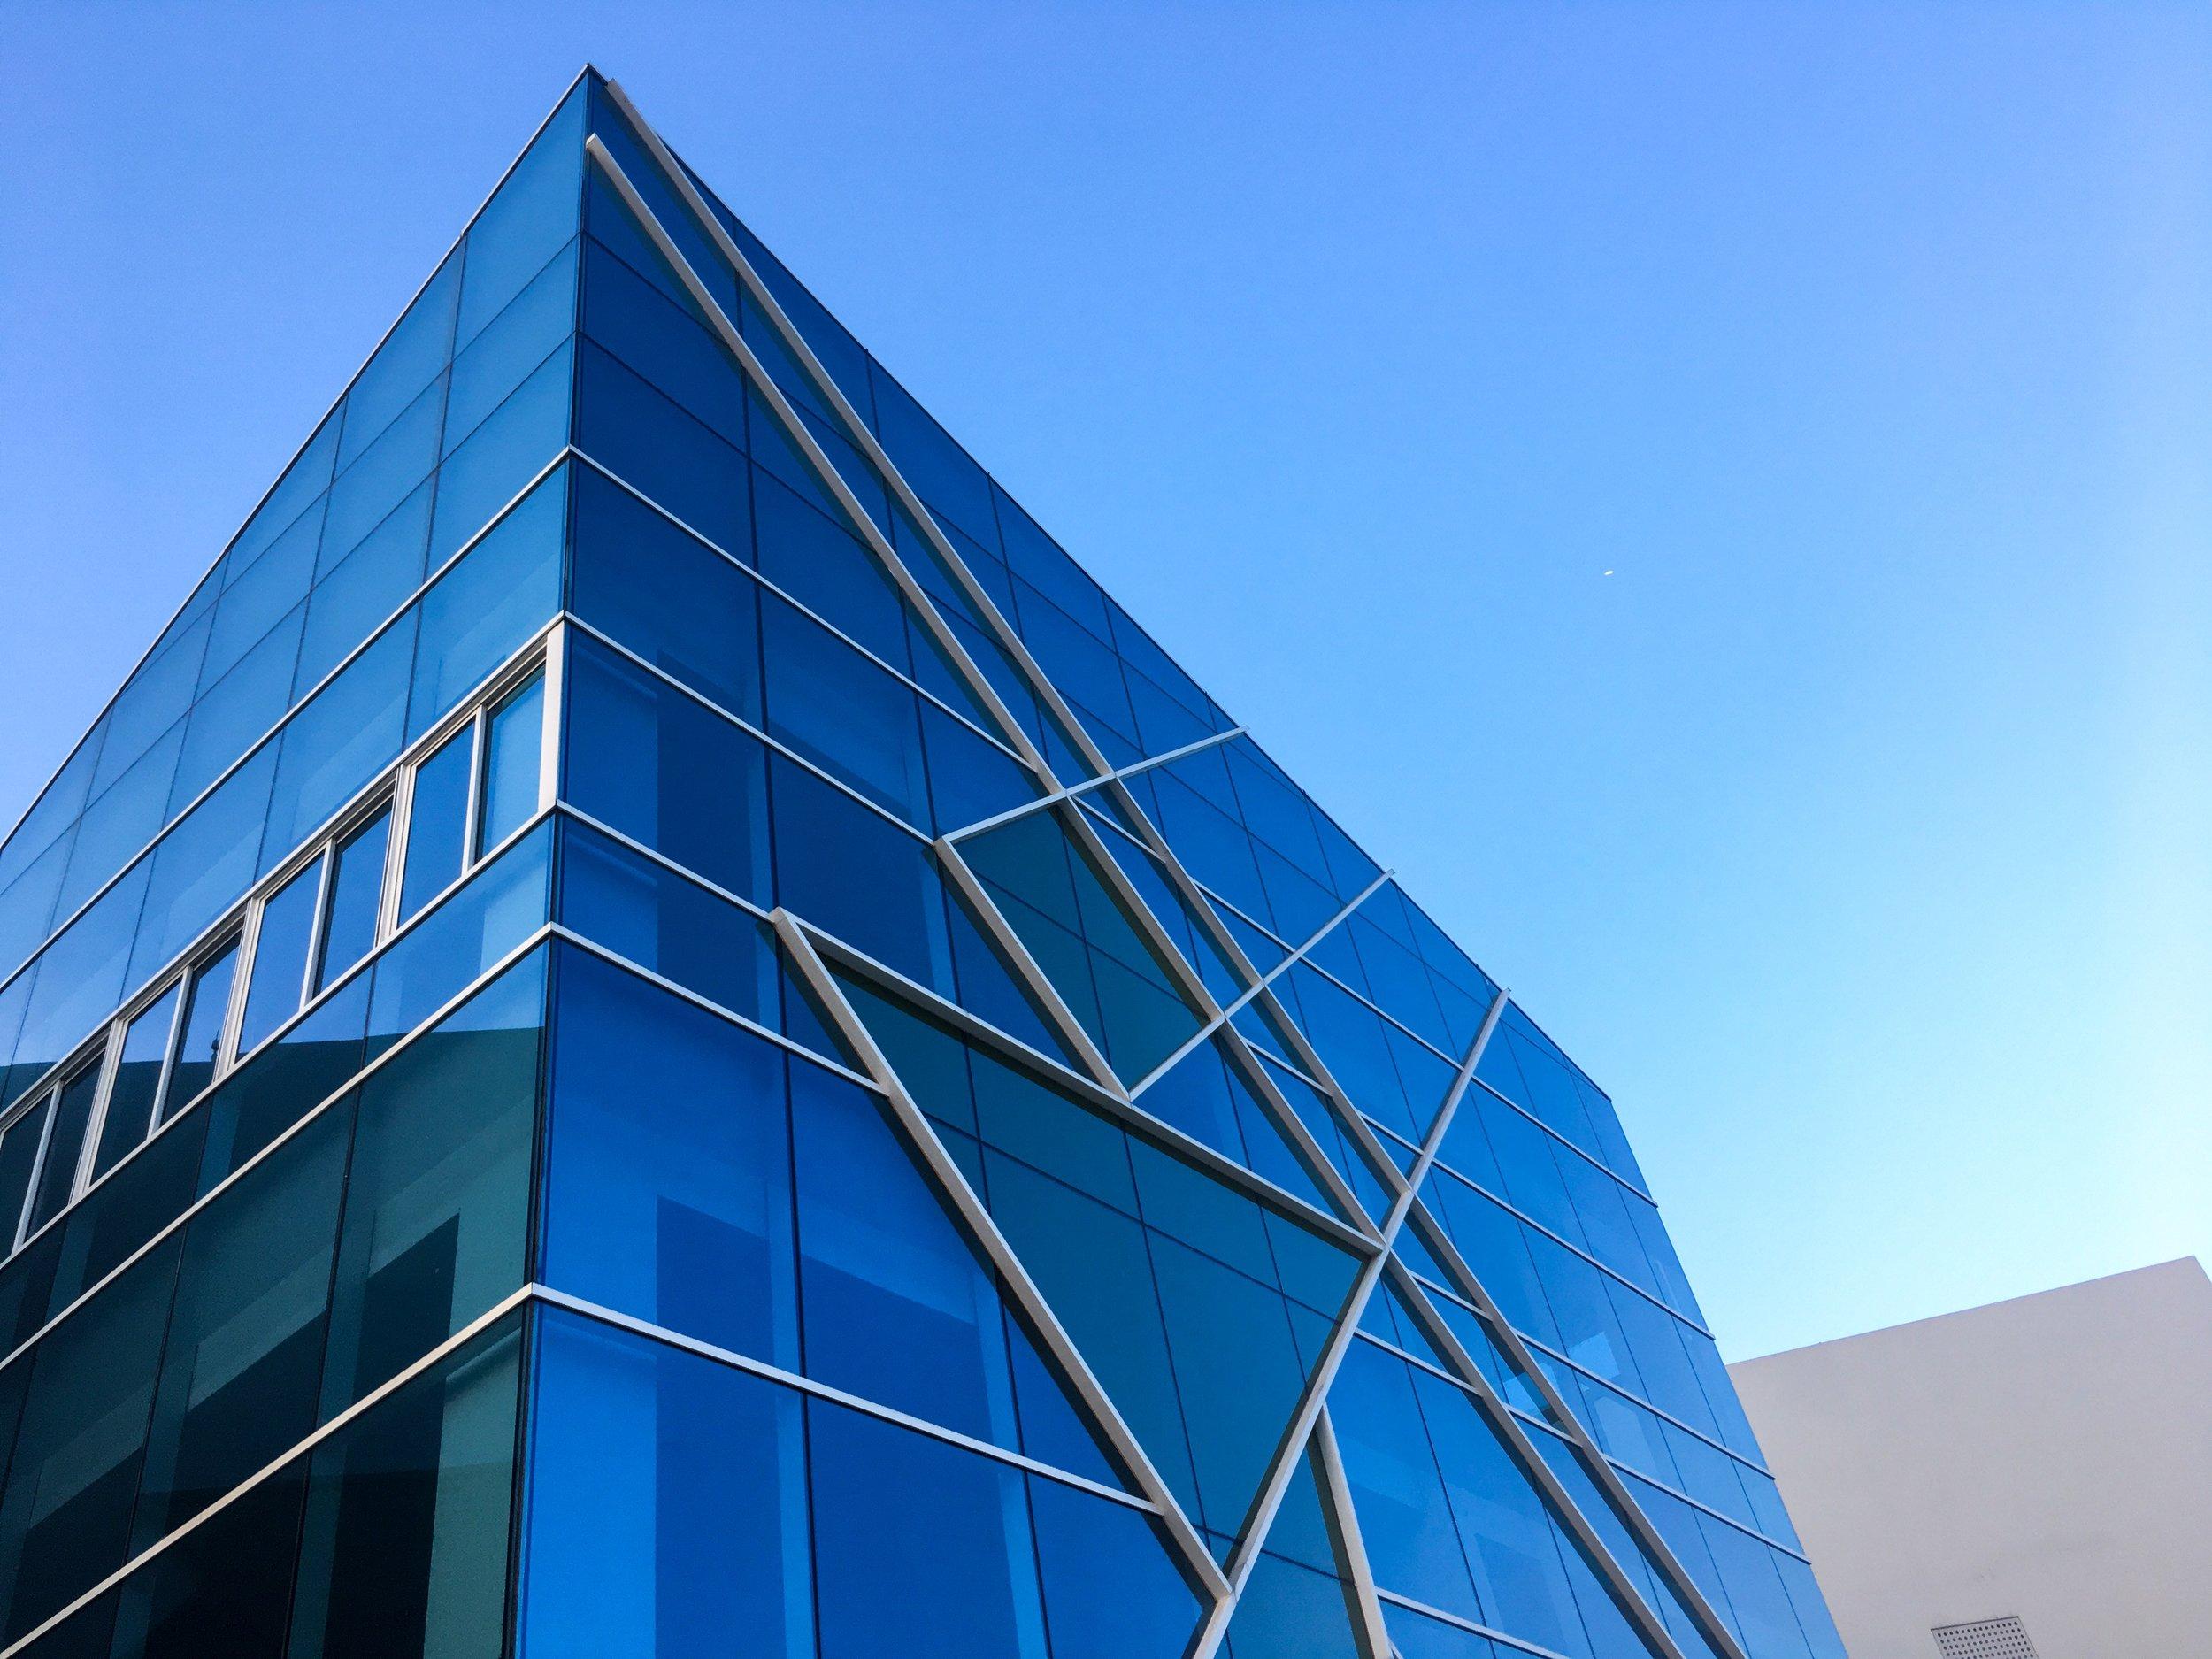 architectural-design-architecture-blue-sky-410696 (1).jpg